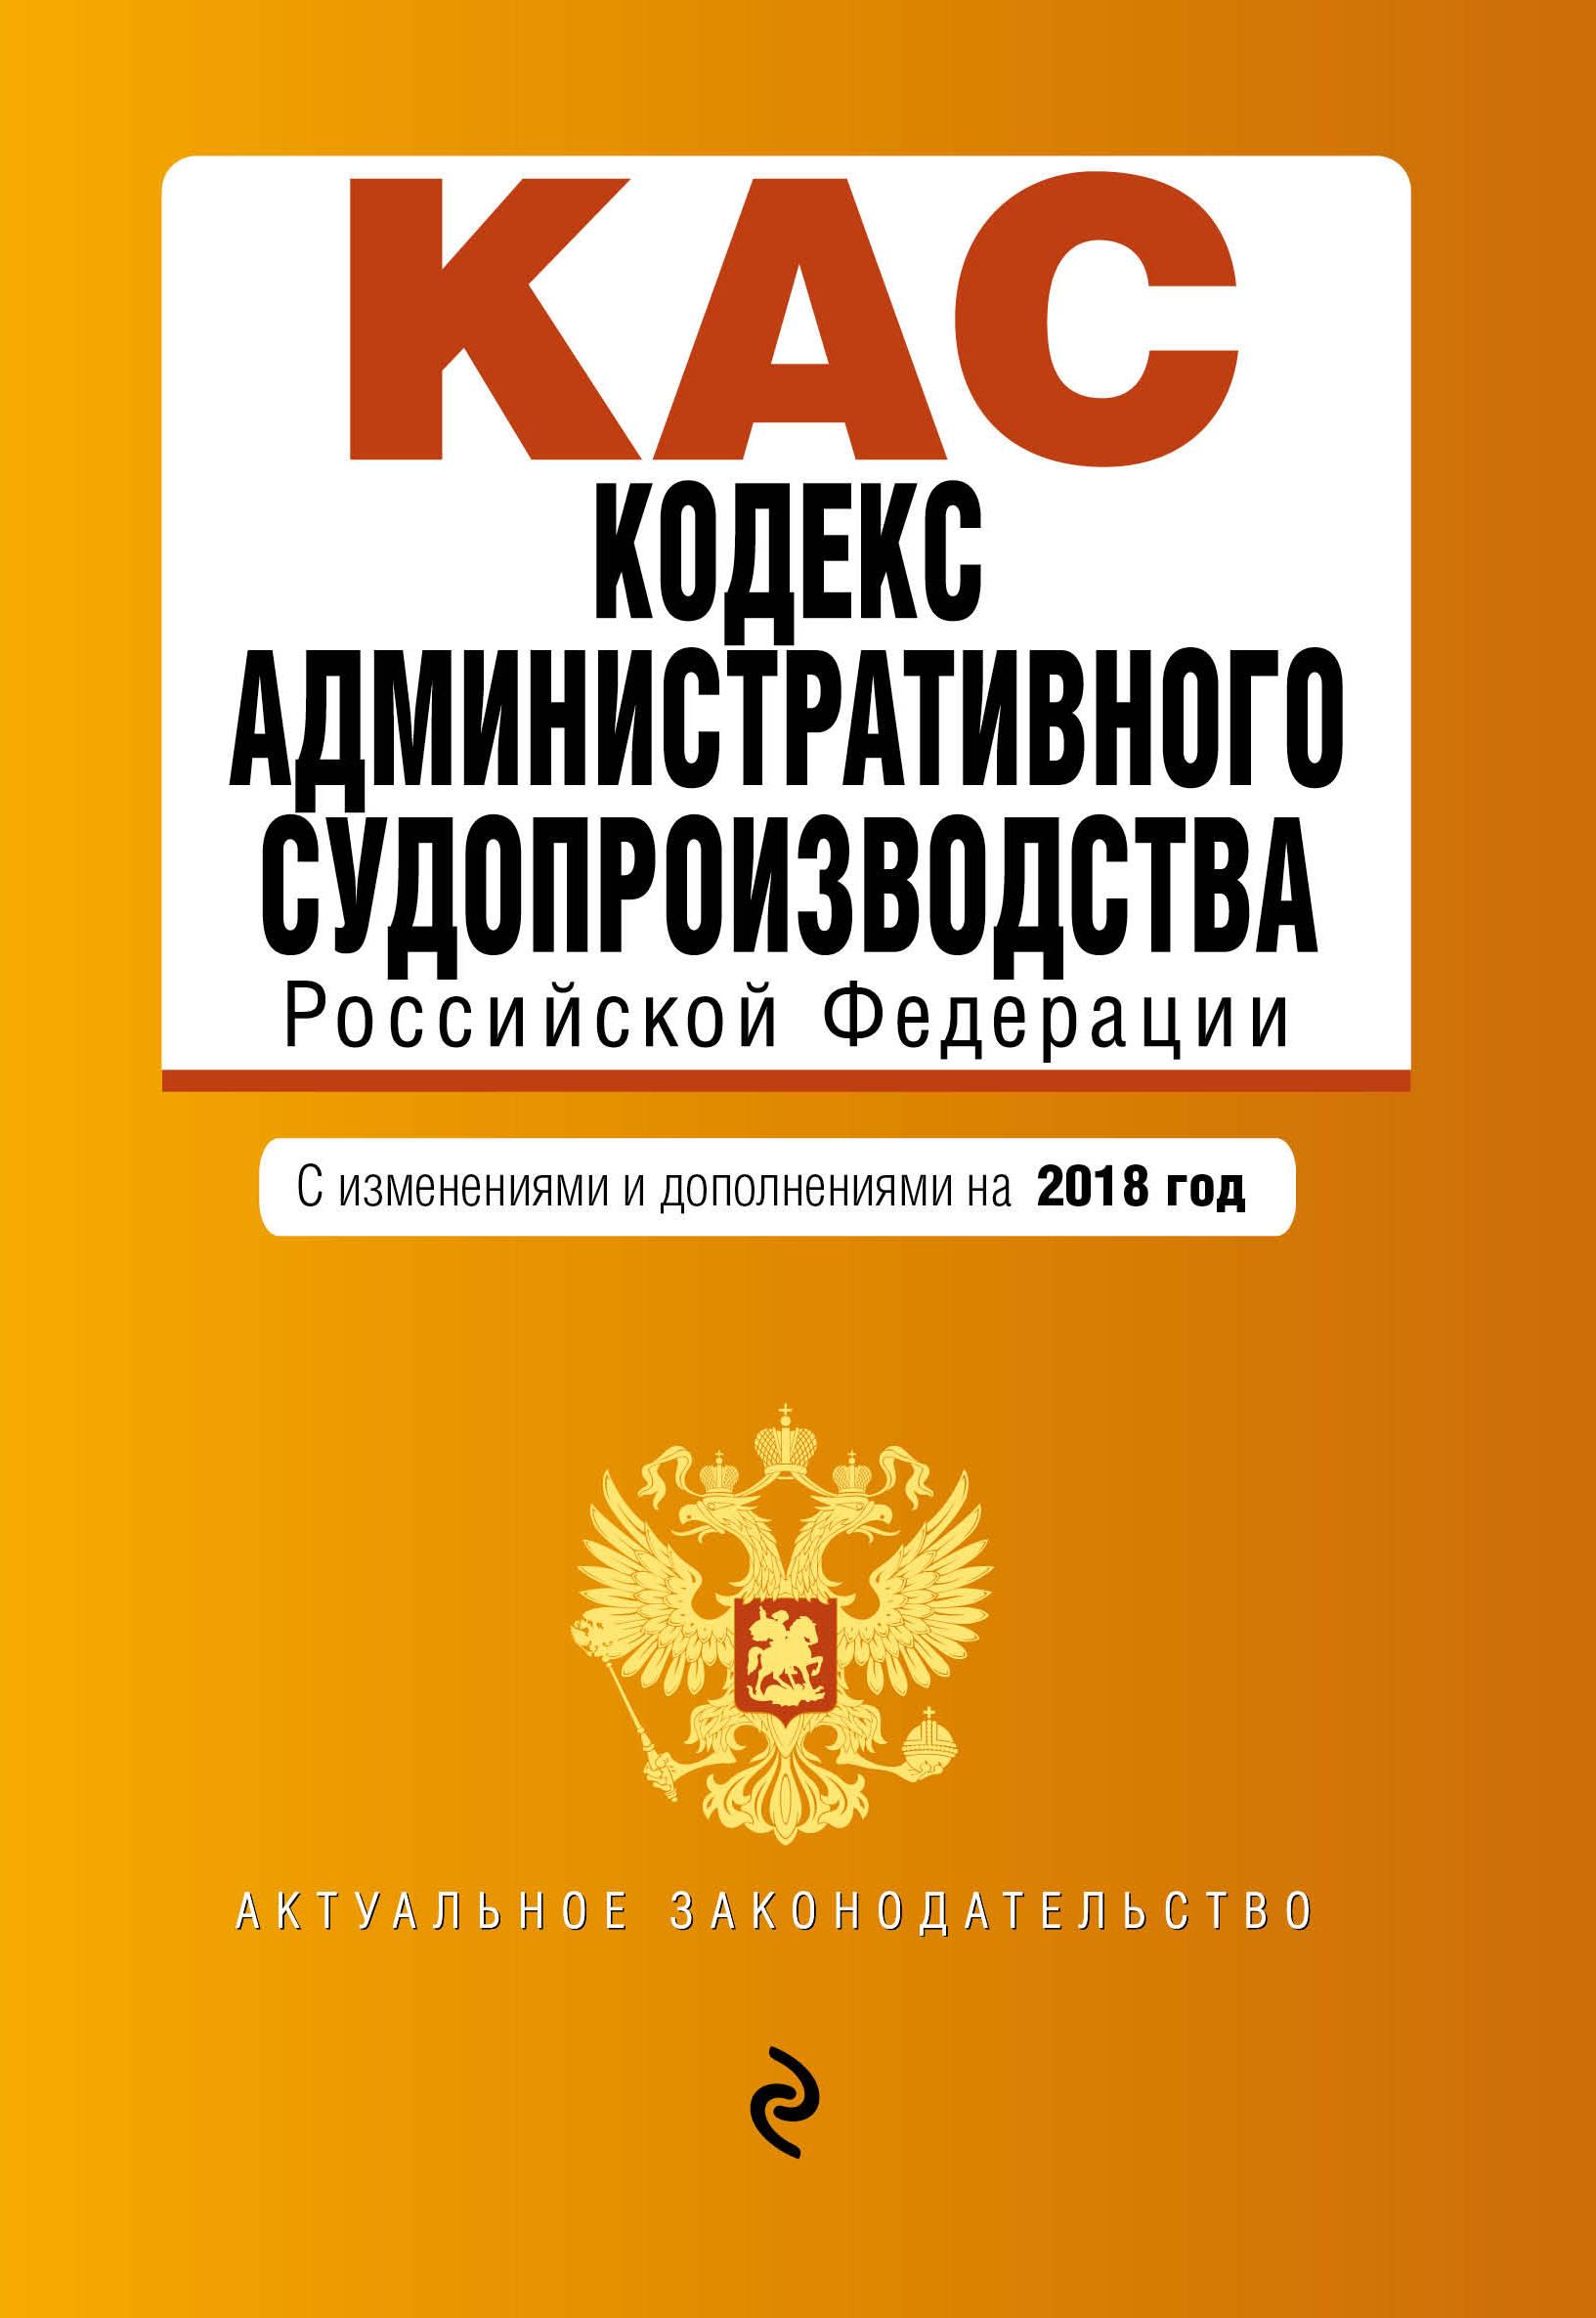 Кодекс административного судопроизводства Российской Федерации кодекс административного судопроизводства рф текст с изм и доп на 2019 г